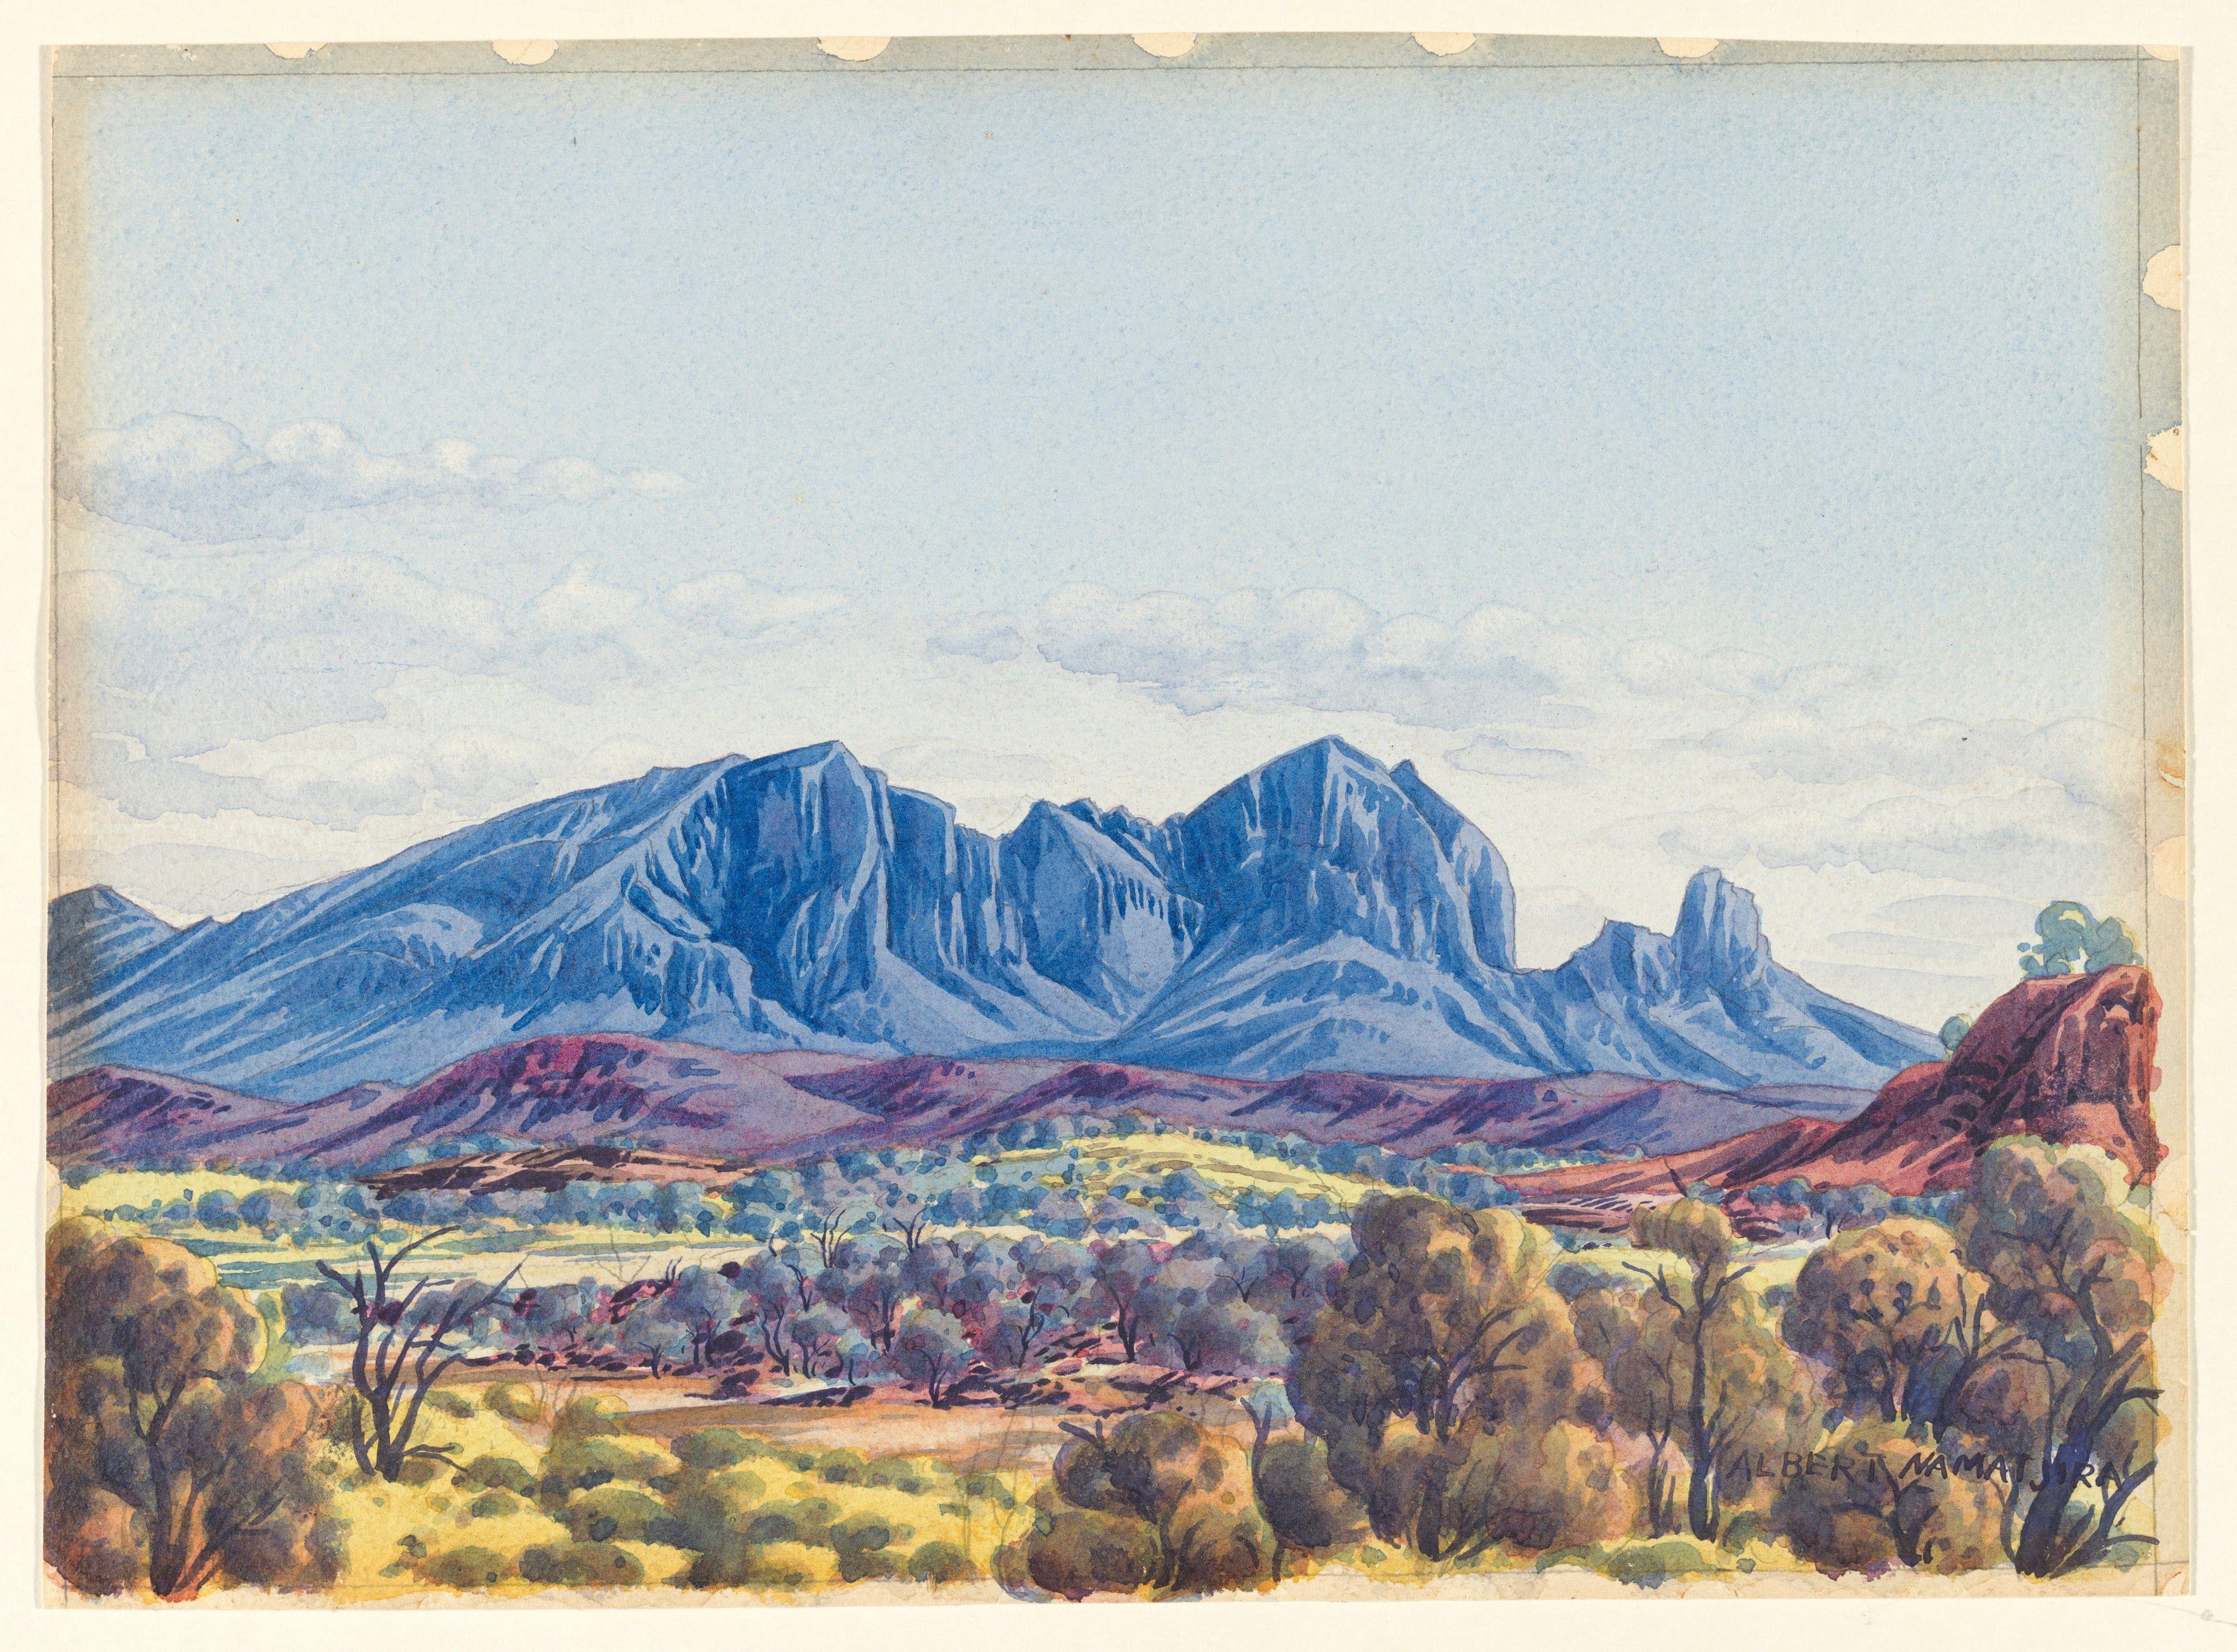 Albert Namatjira Vivid Watercolours Of The Australian Outback In Pictures Landscape Artist Landscape Paintings Landscape